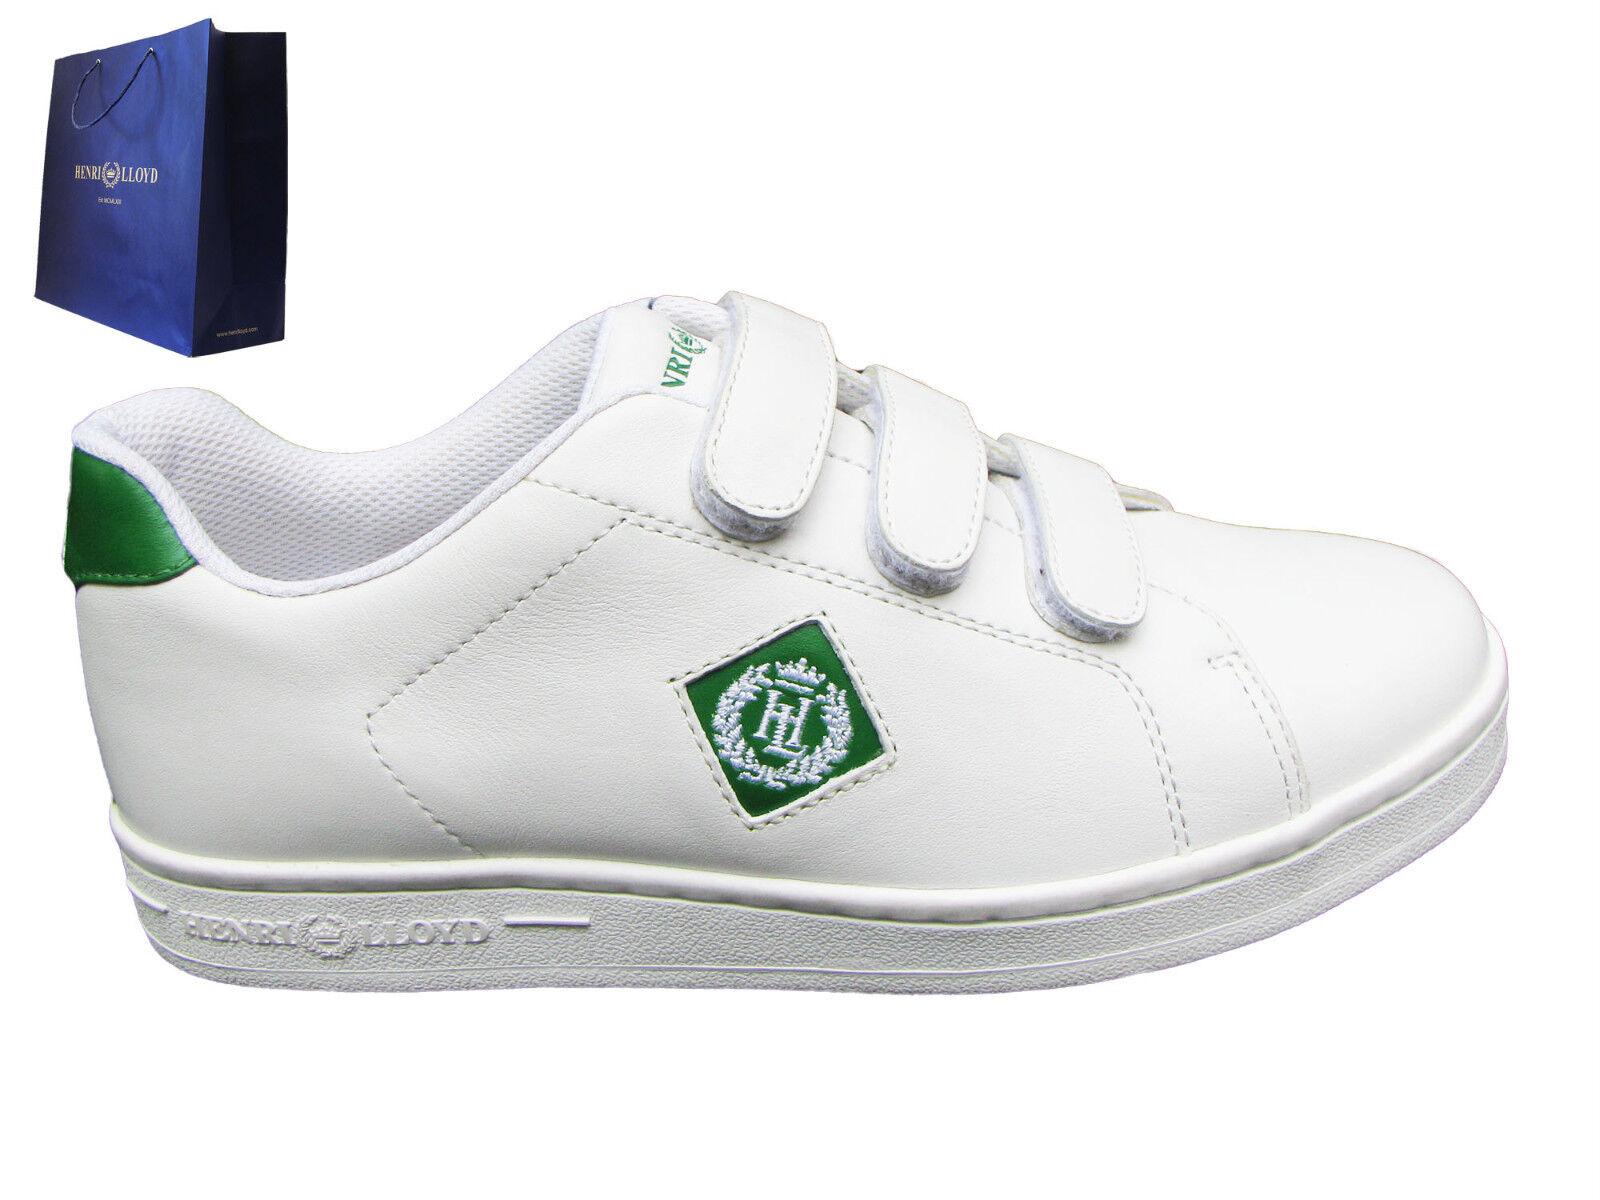 New HENRI LLOYD SHOT 3 STRAP hommes Trainers Chaussures blanc & Green8 EU 42 USA 9